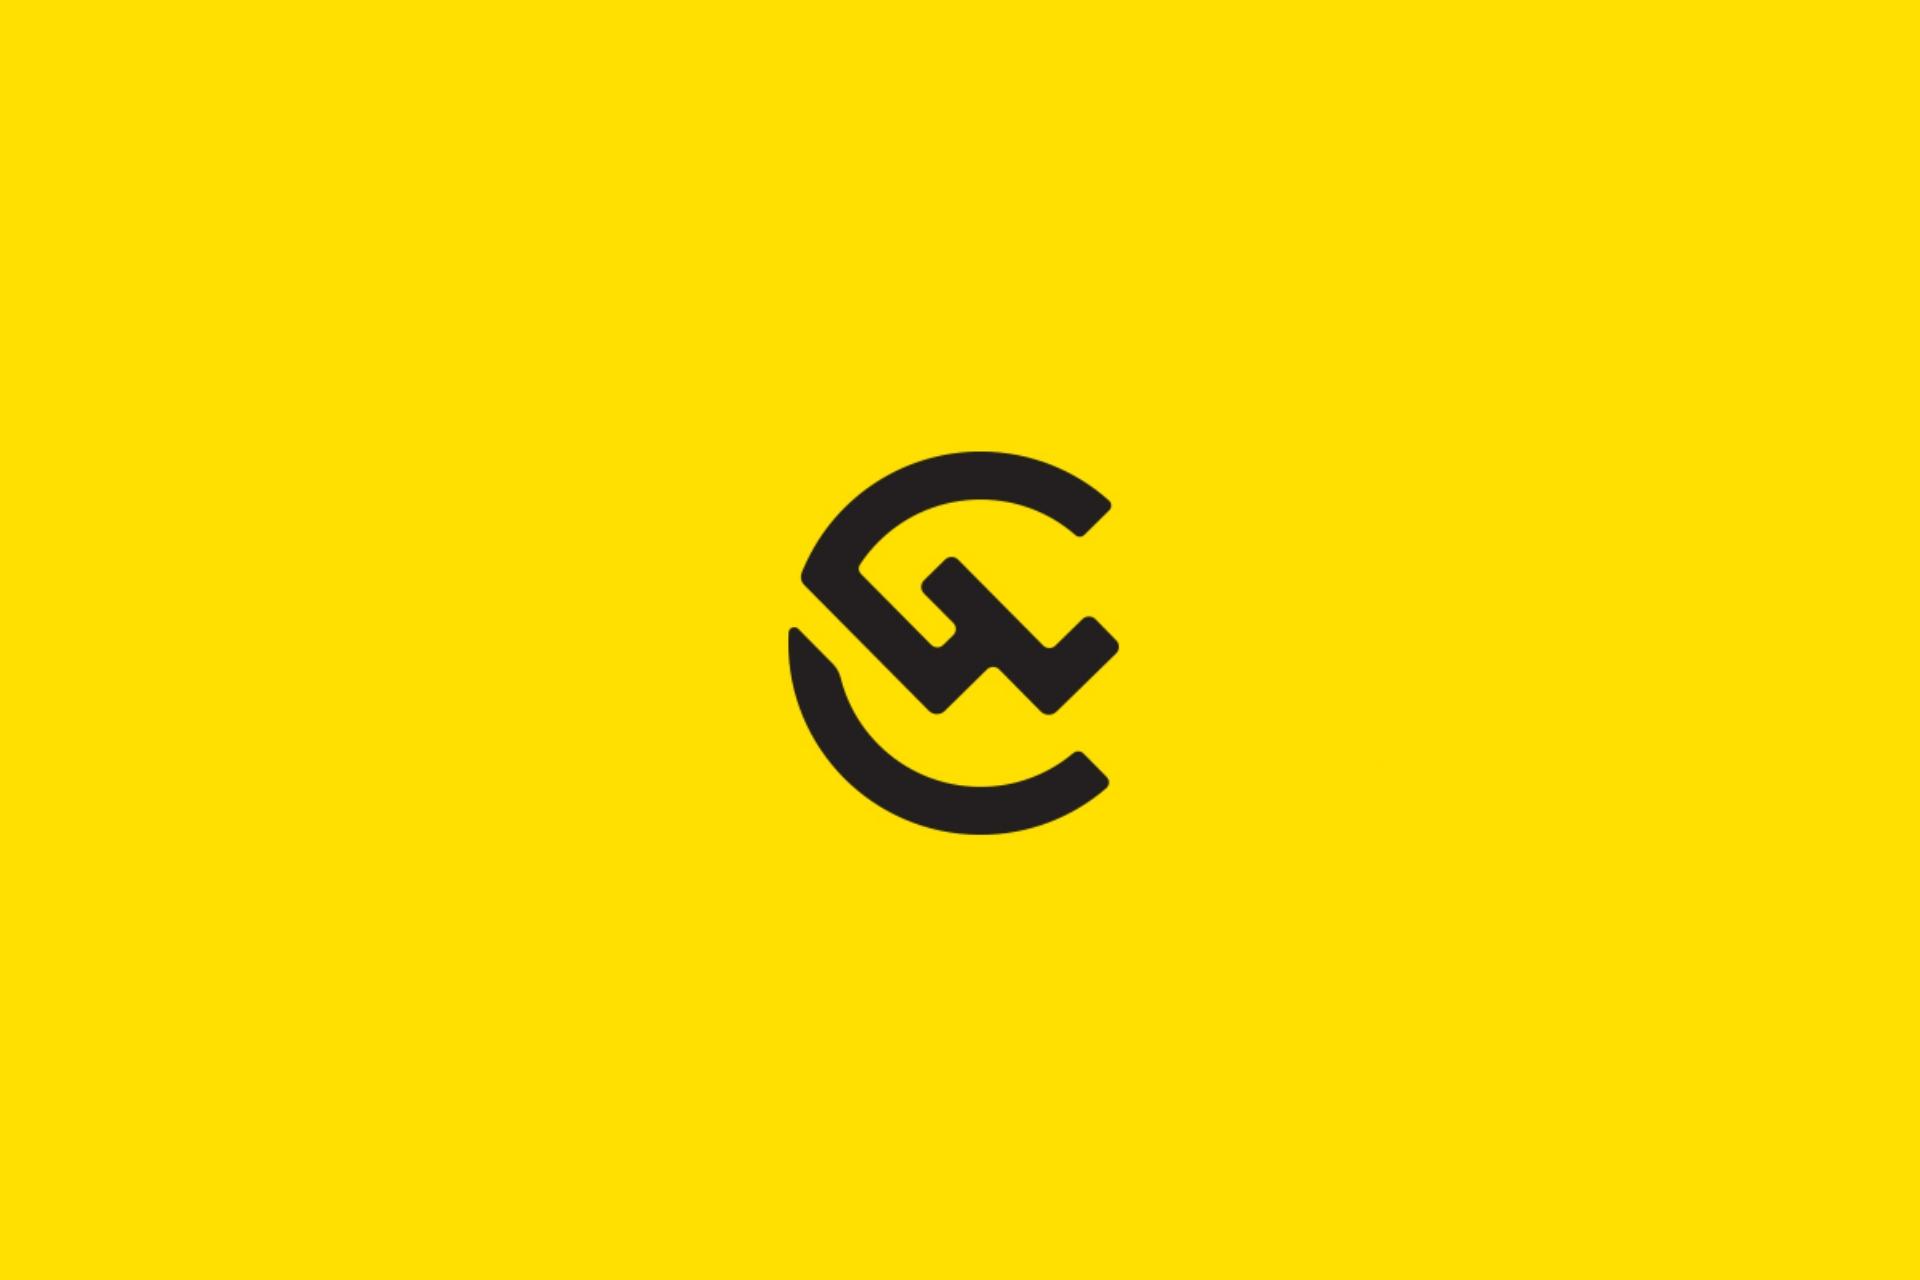 cw_mark.jpg